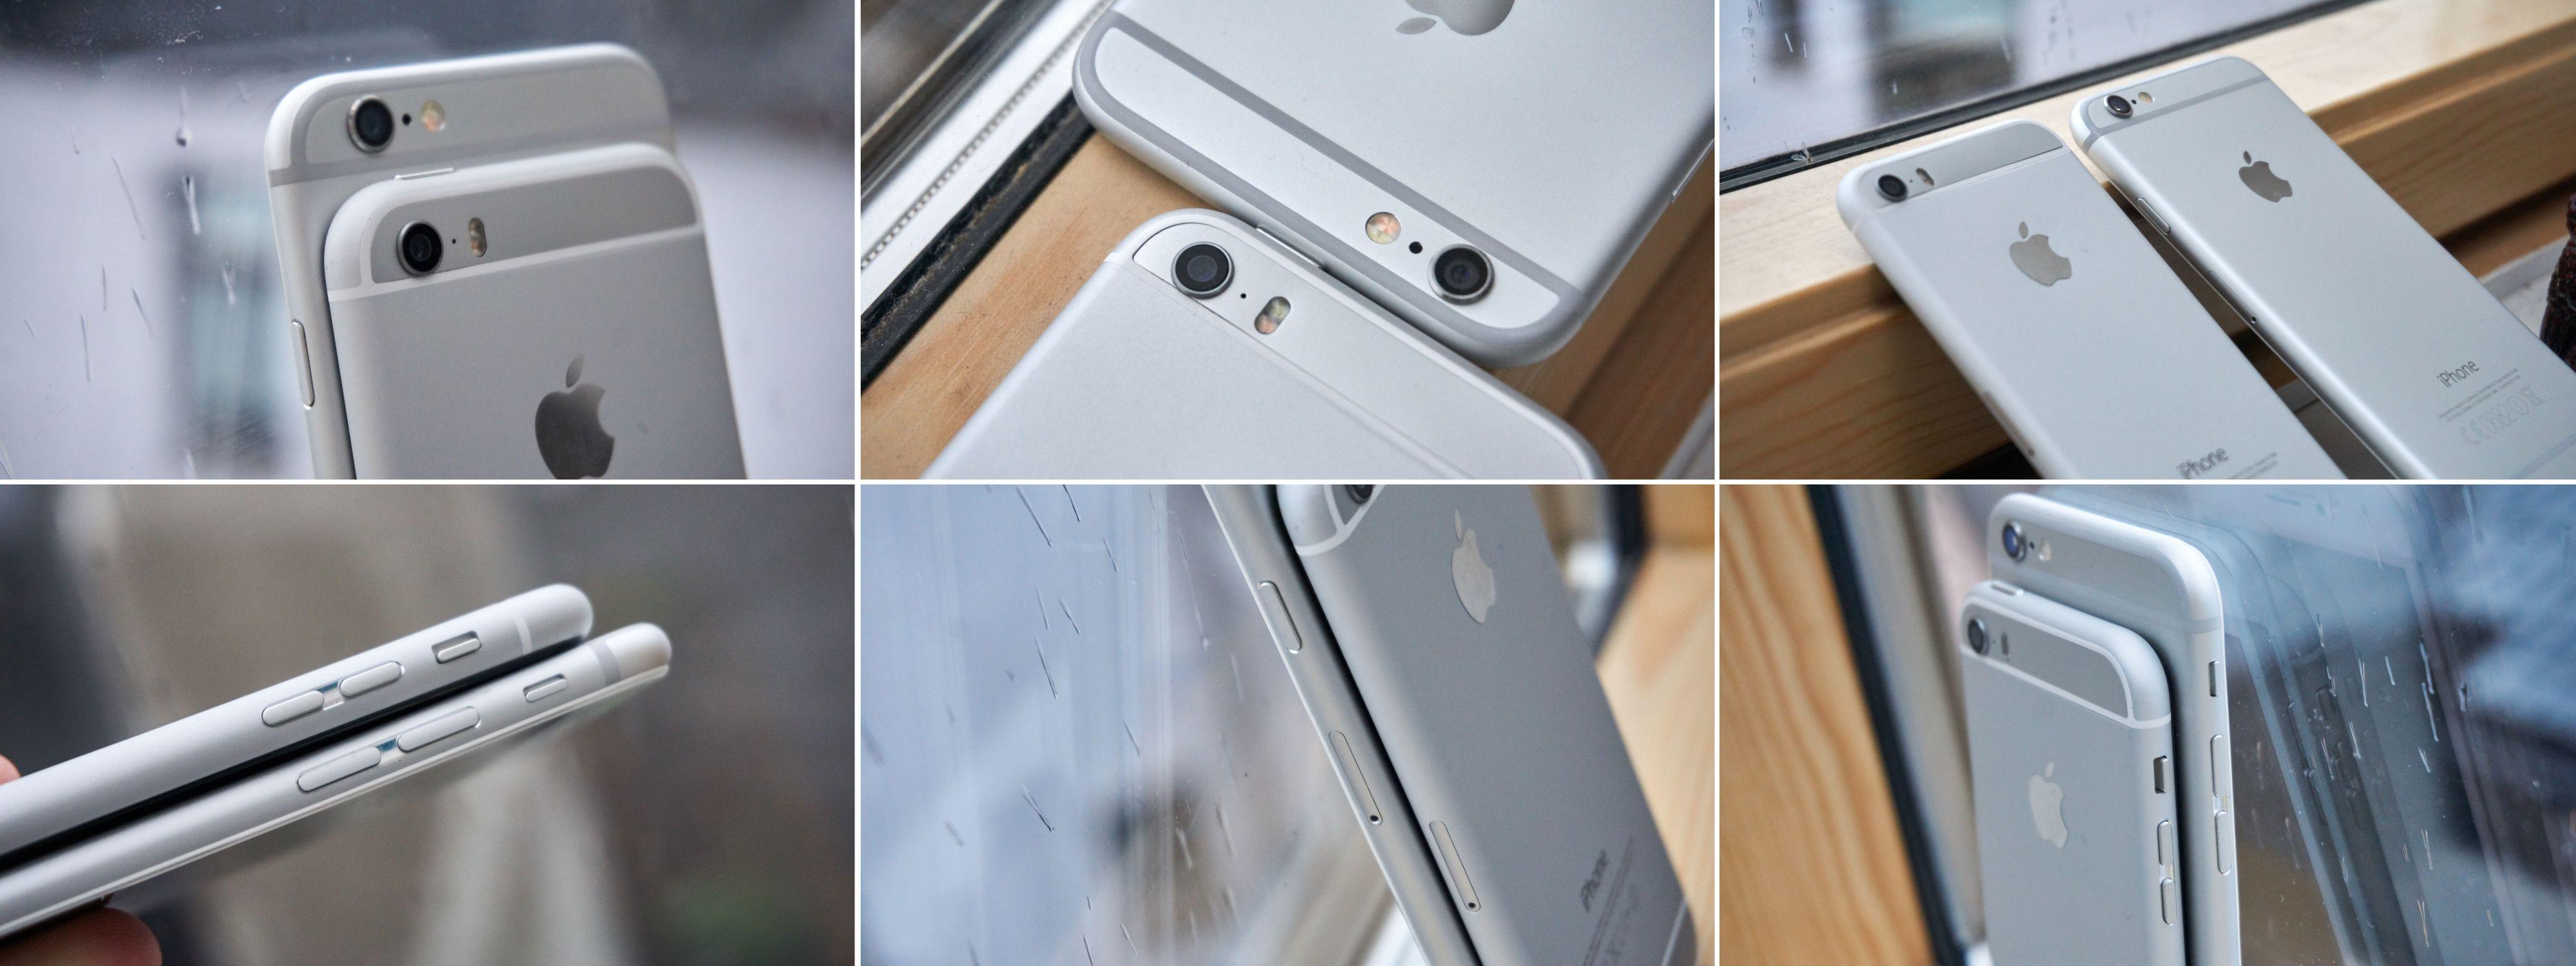 Den lille iPhonen sammenlignet med en iPhone 6.